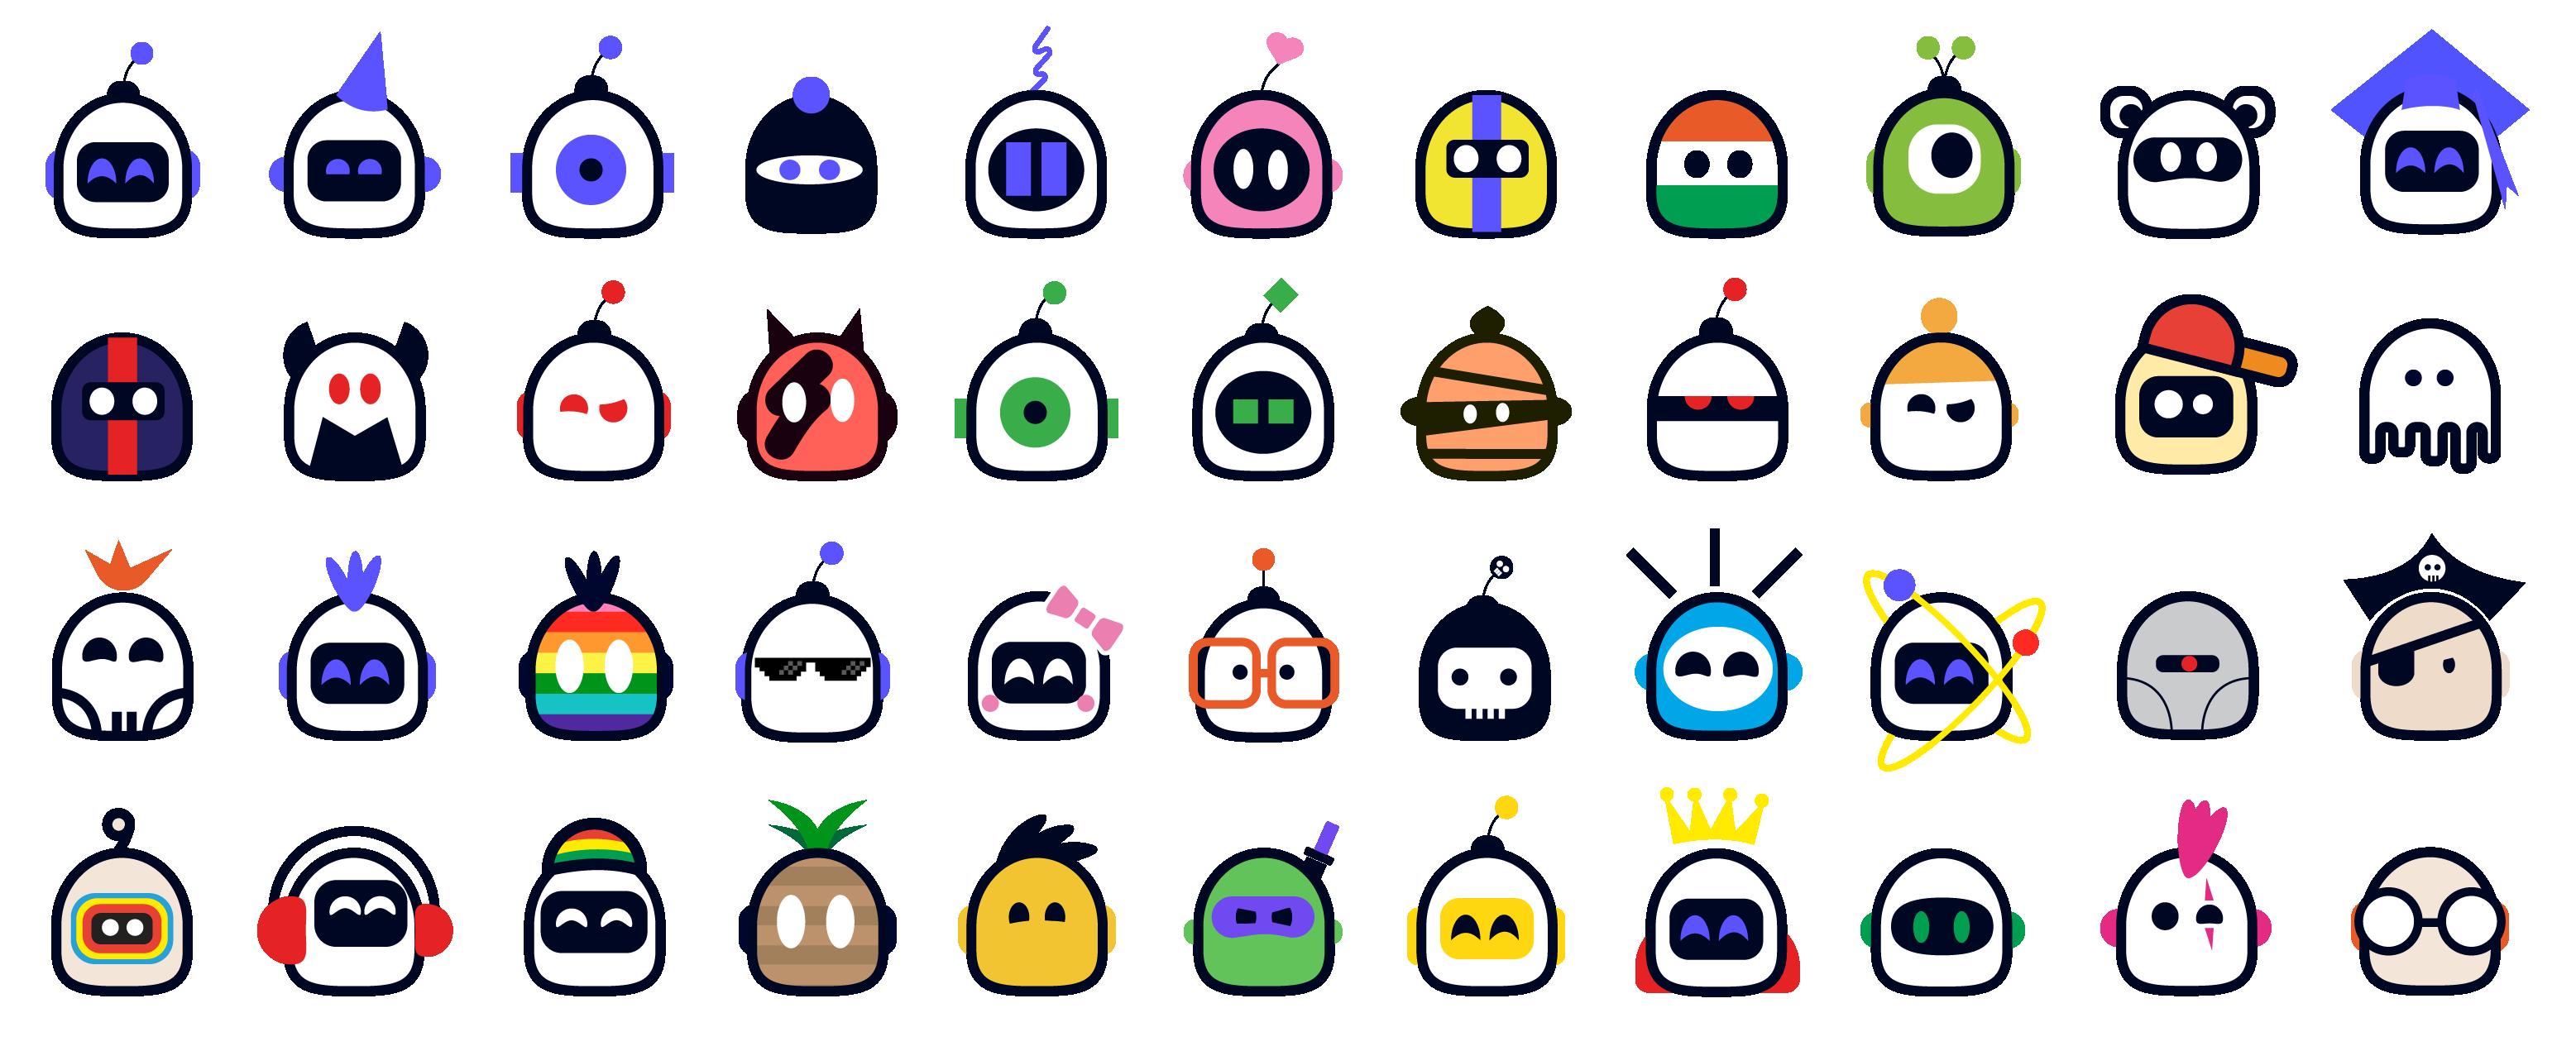 avatars-02